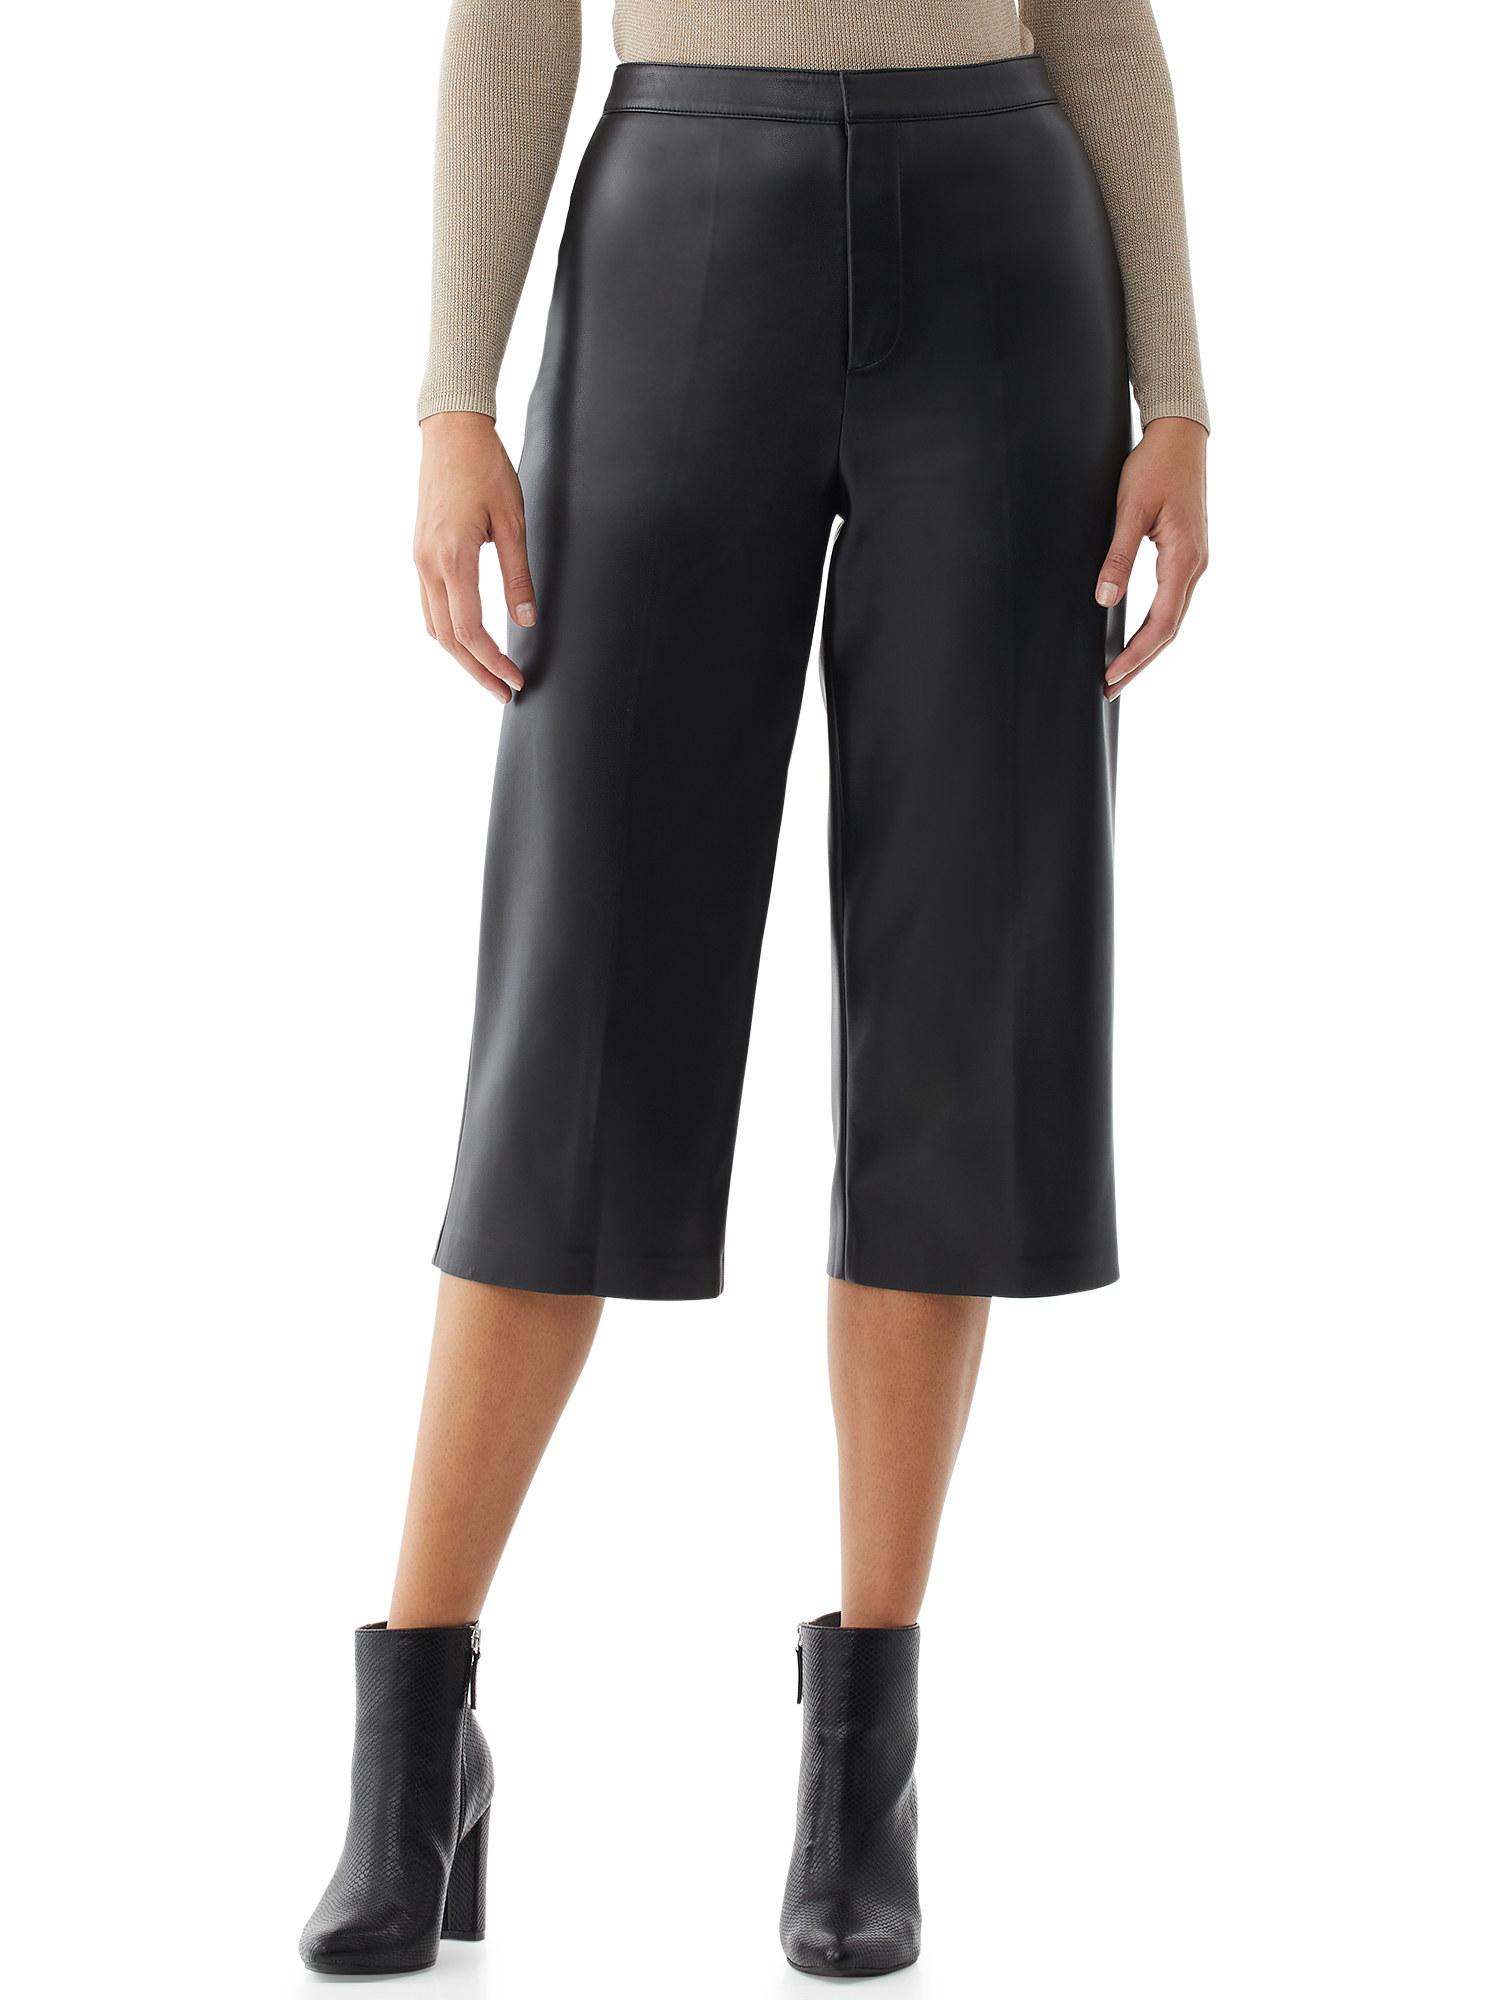 Model wearing faux leather pants